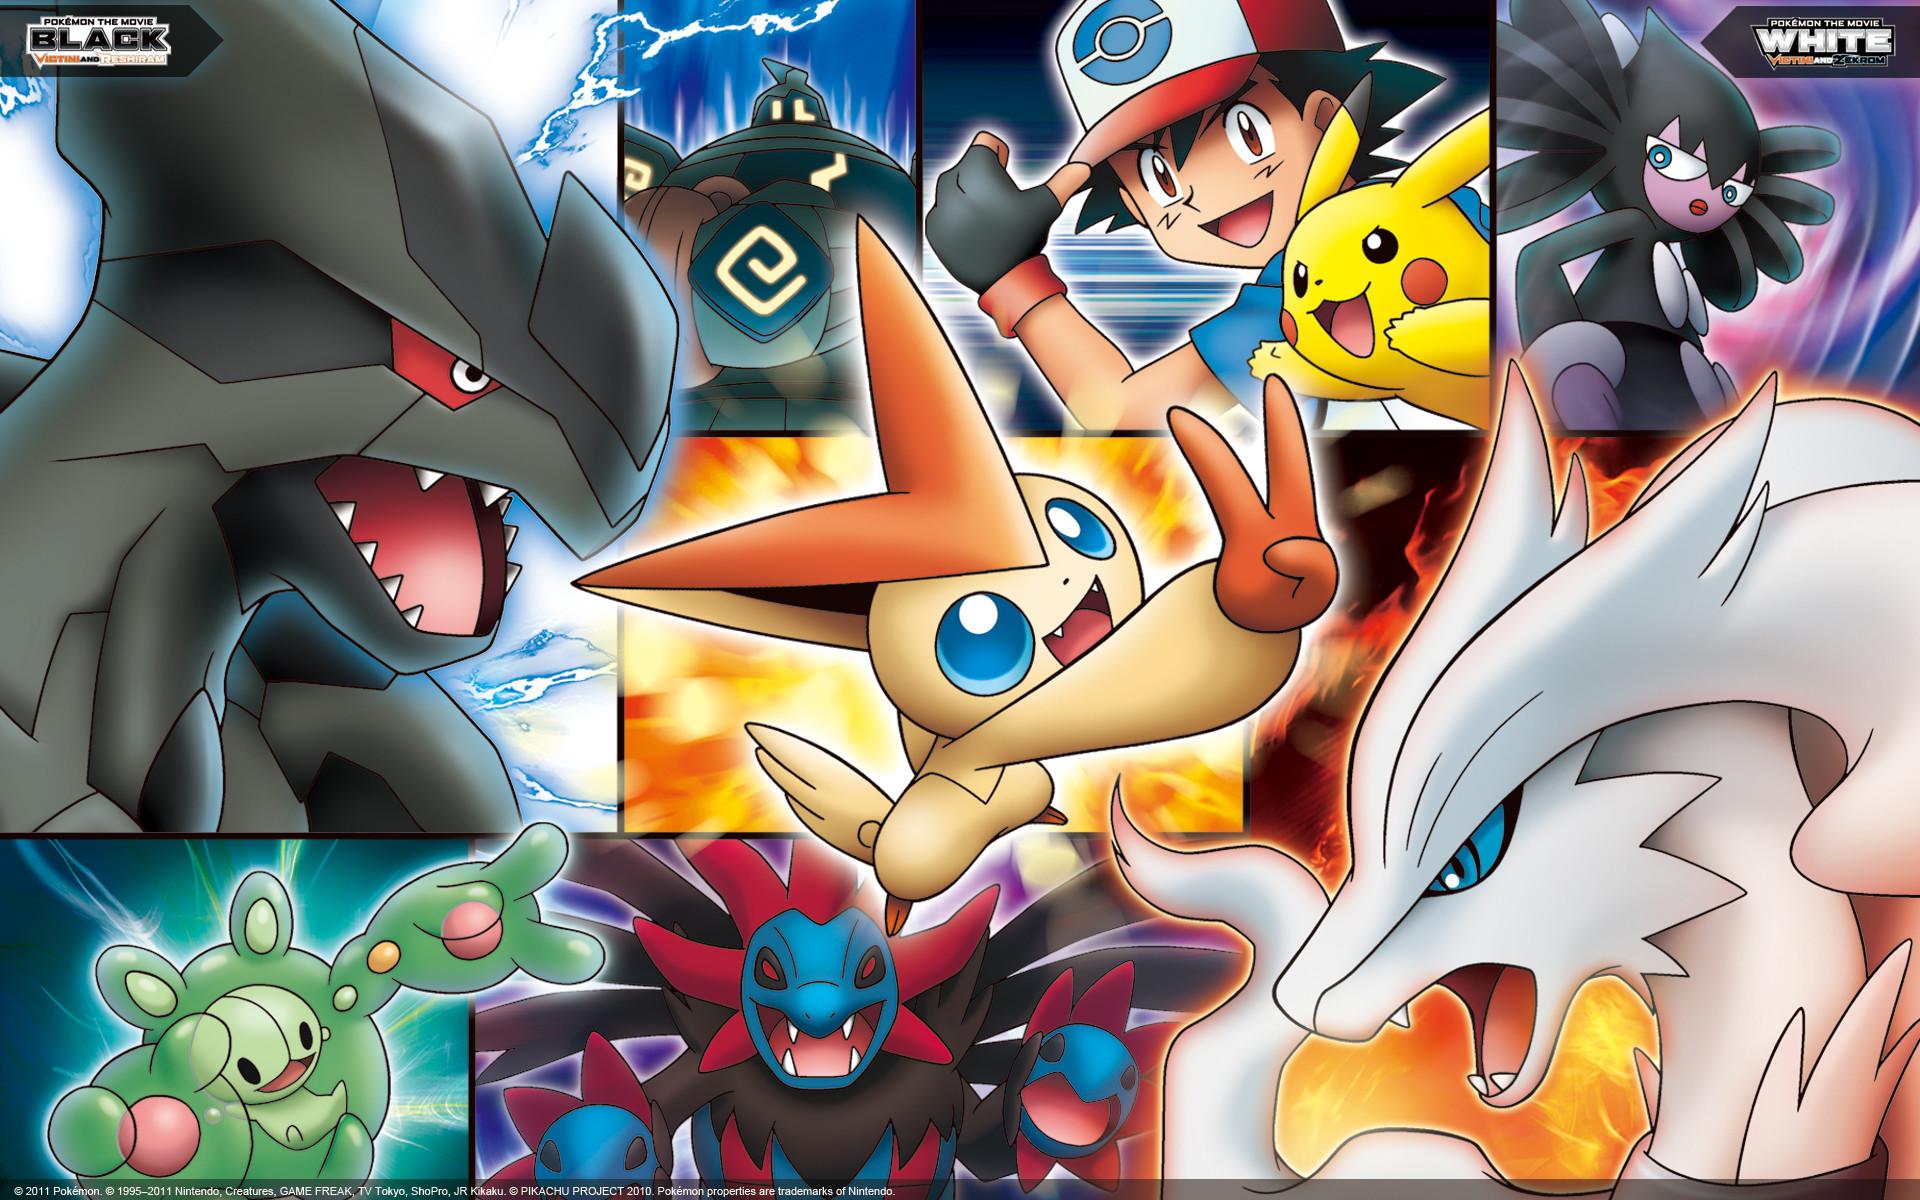 Pokémon the Movie: Collage Wallpaper